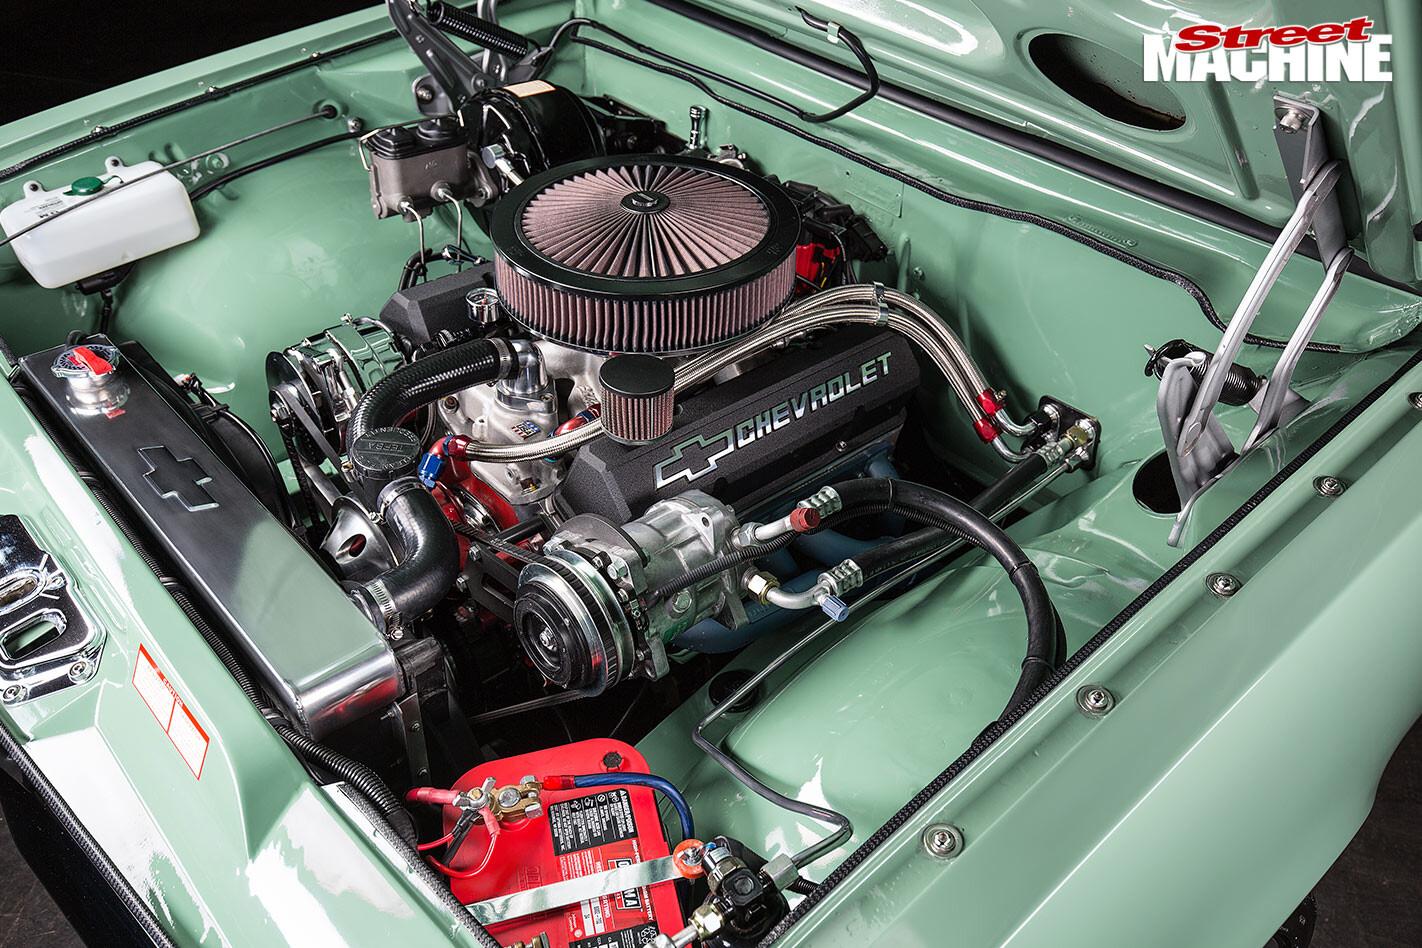 Holden HK wagon engine bay